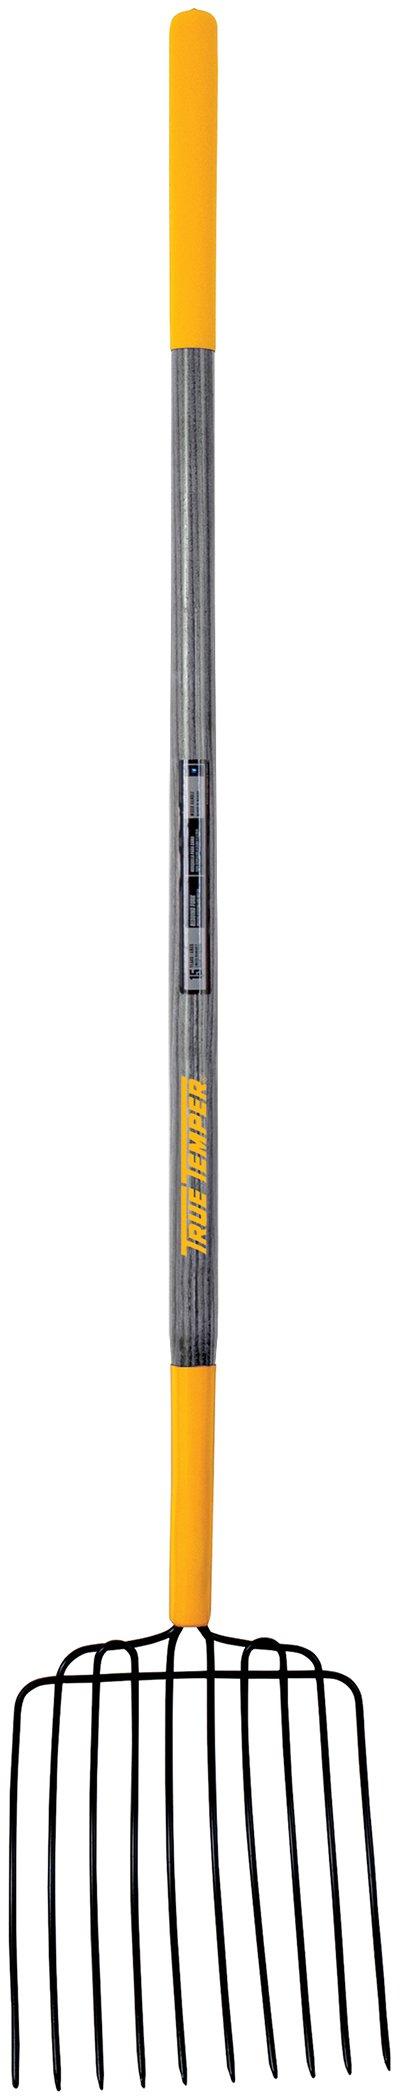 The AMES Companies, Inc True Temper 10-Tine Hardwood Handle Bedding Fork - 2812400